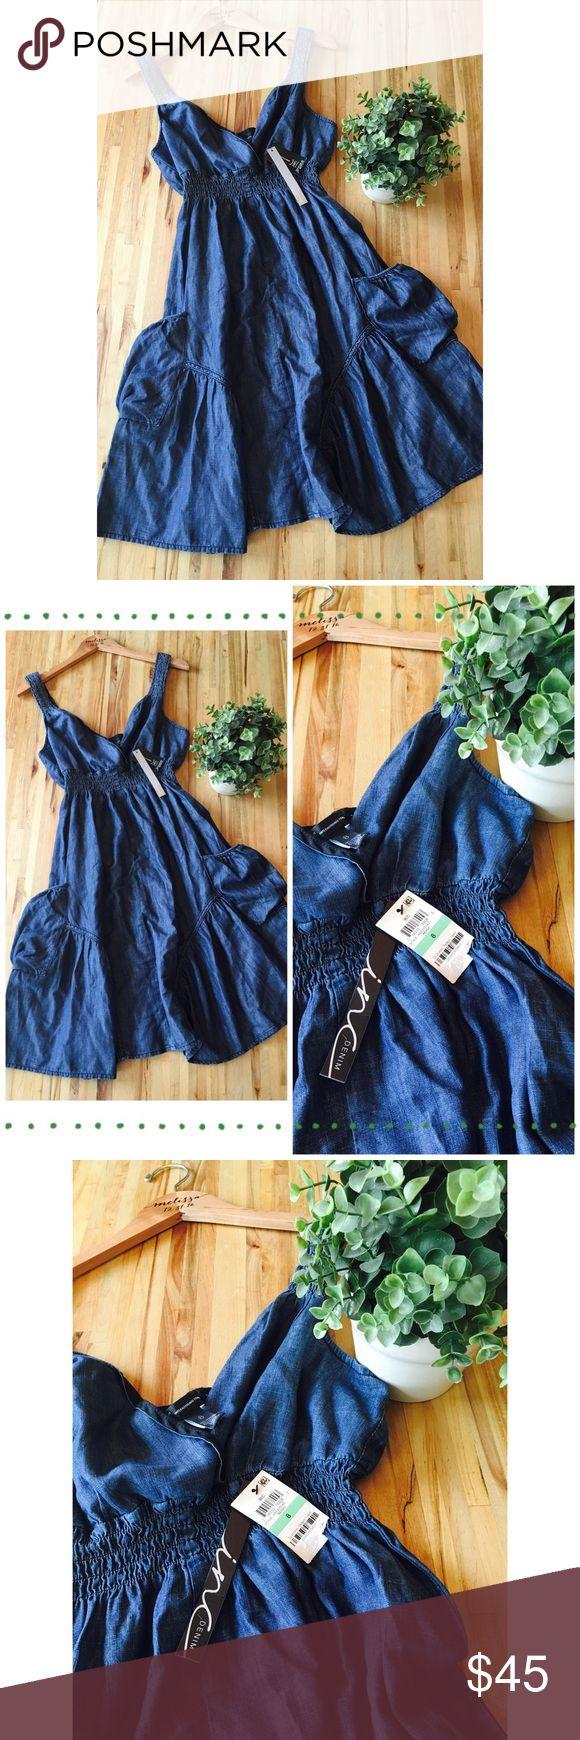 Macy's INC Denim Dress! Lightweight & Soft! Macy's INC Denim Dress! V neck with elastic under bust. Two pouch side pockets! Super cute! INC International Concepts Dresses